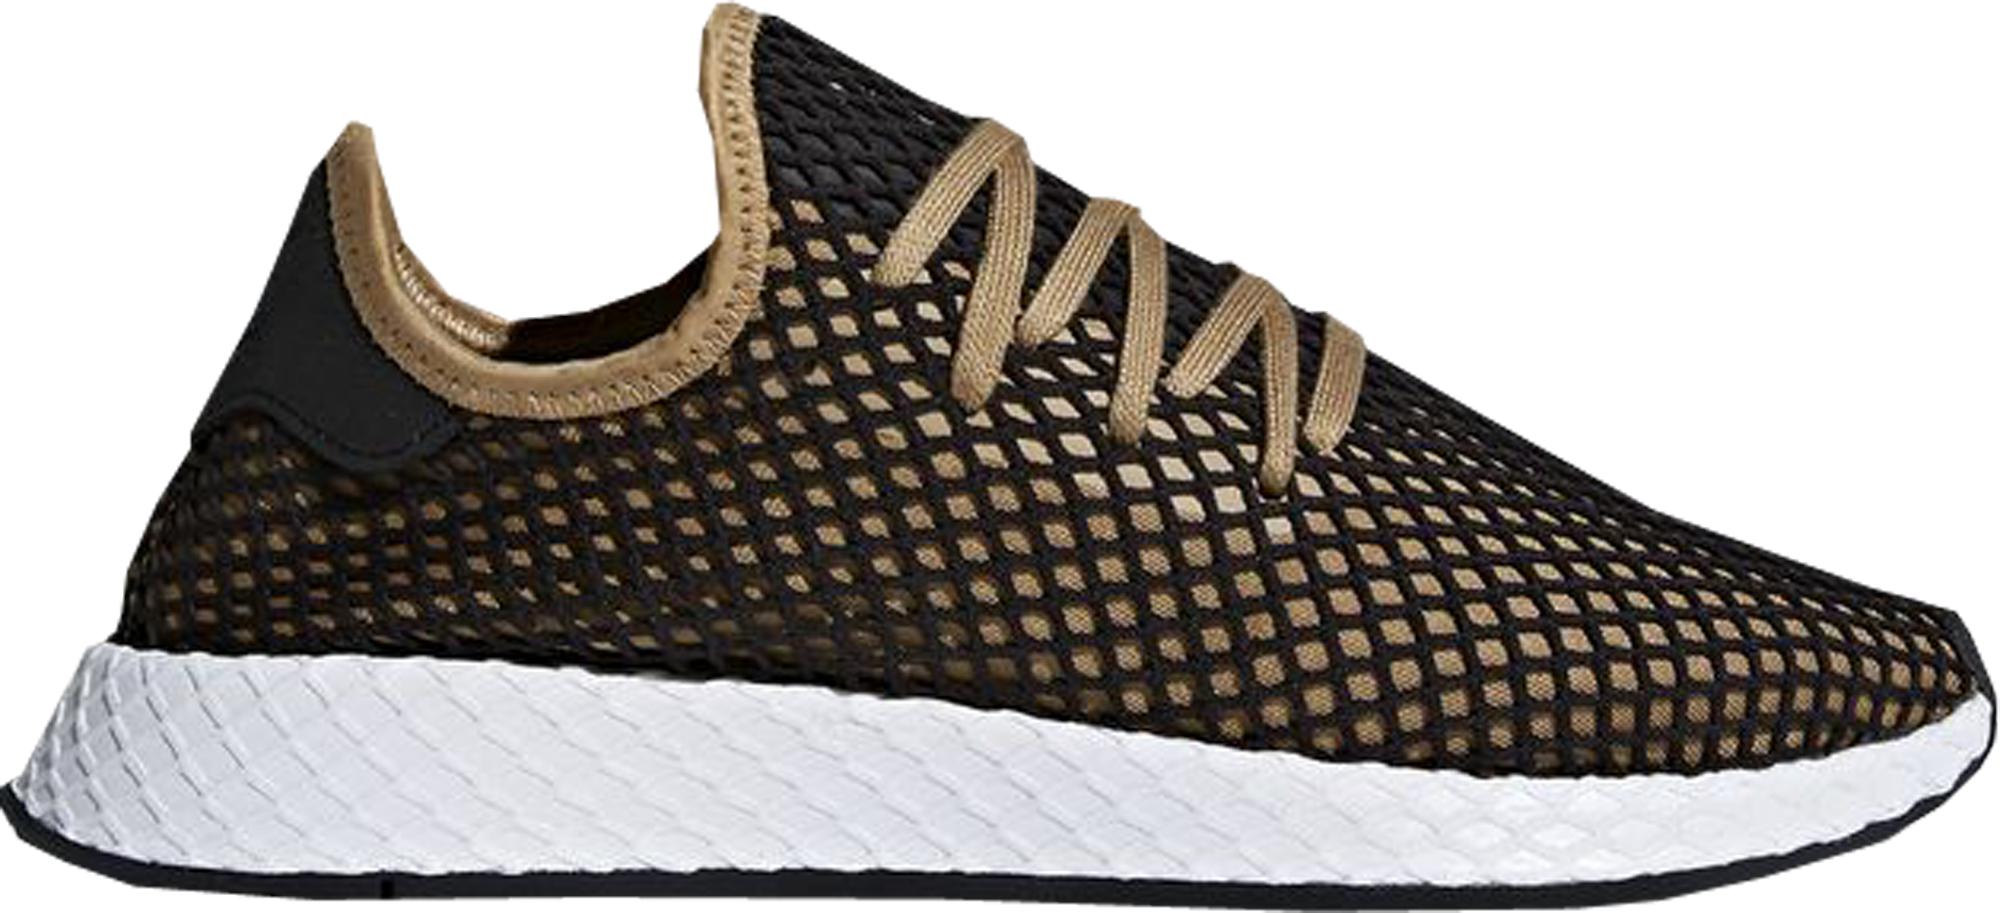 adidas deerupt black and gold|54% OFF